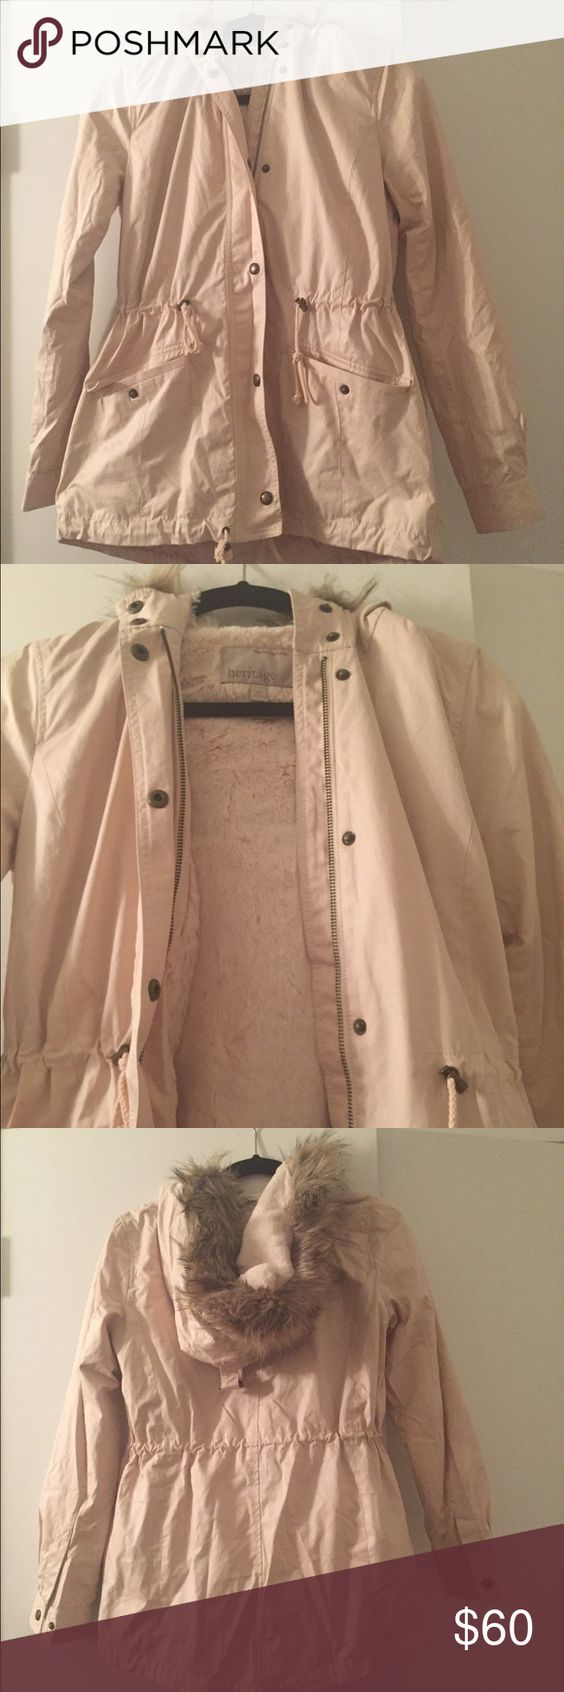 Selling this Banana Republic Heritage soft lined coat on Poshmark! My username is: bmccann315. #shopmycloset #poshmark #fashion #shopping #style #forsale #Banana Republic #Jackets & Blazers